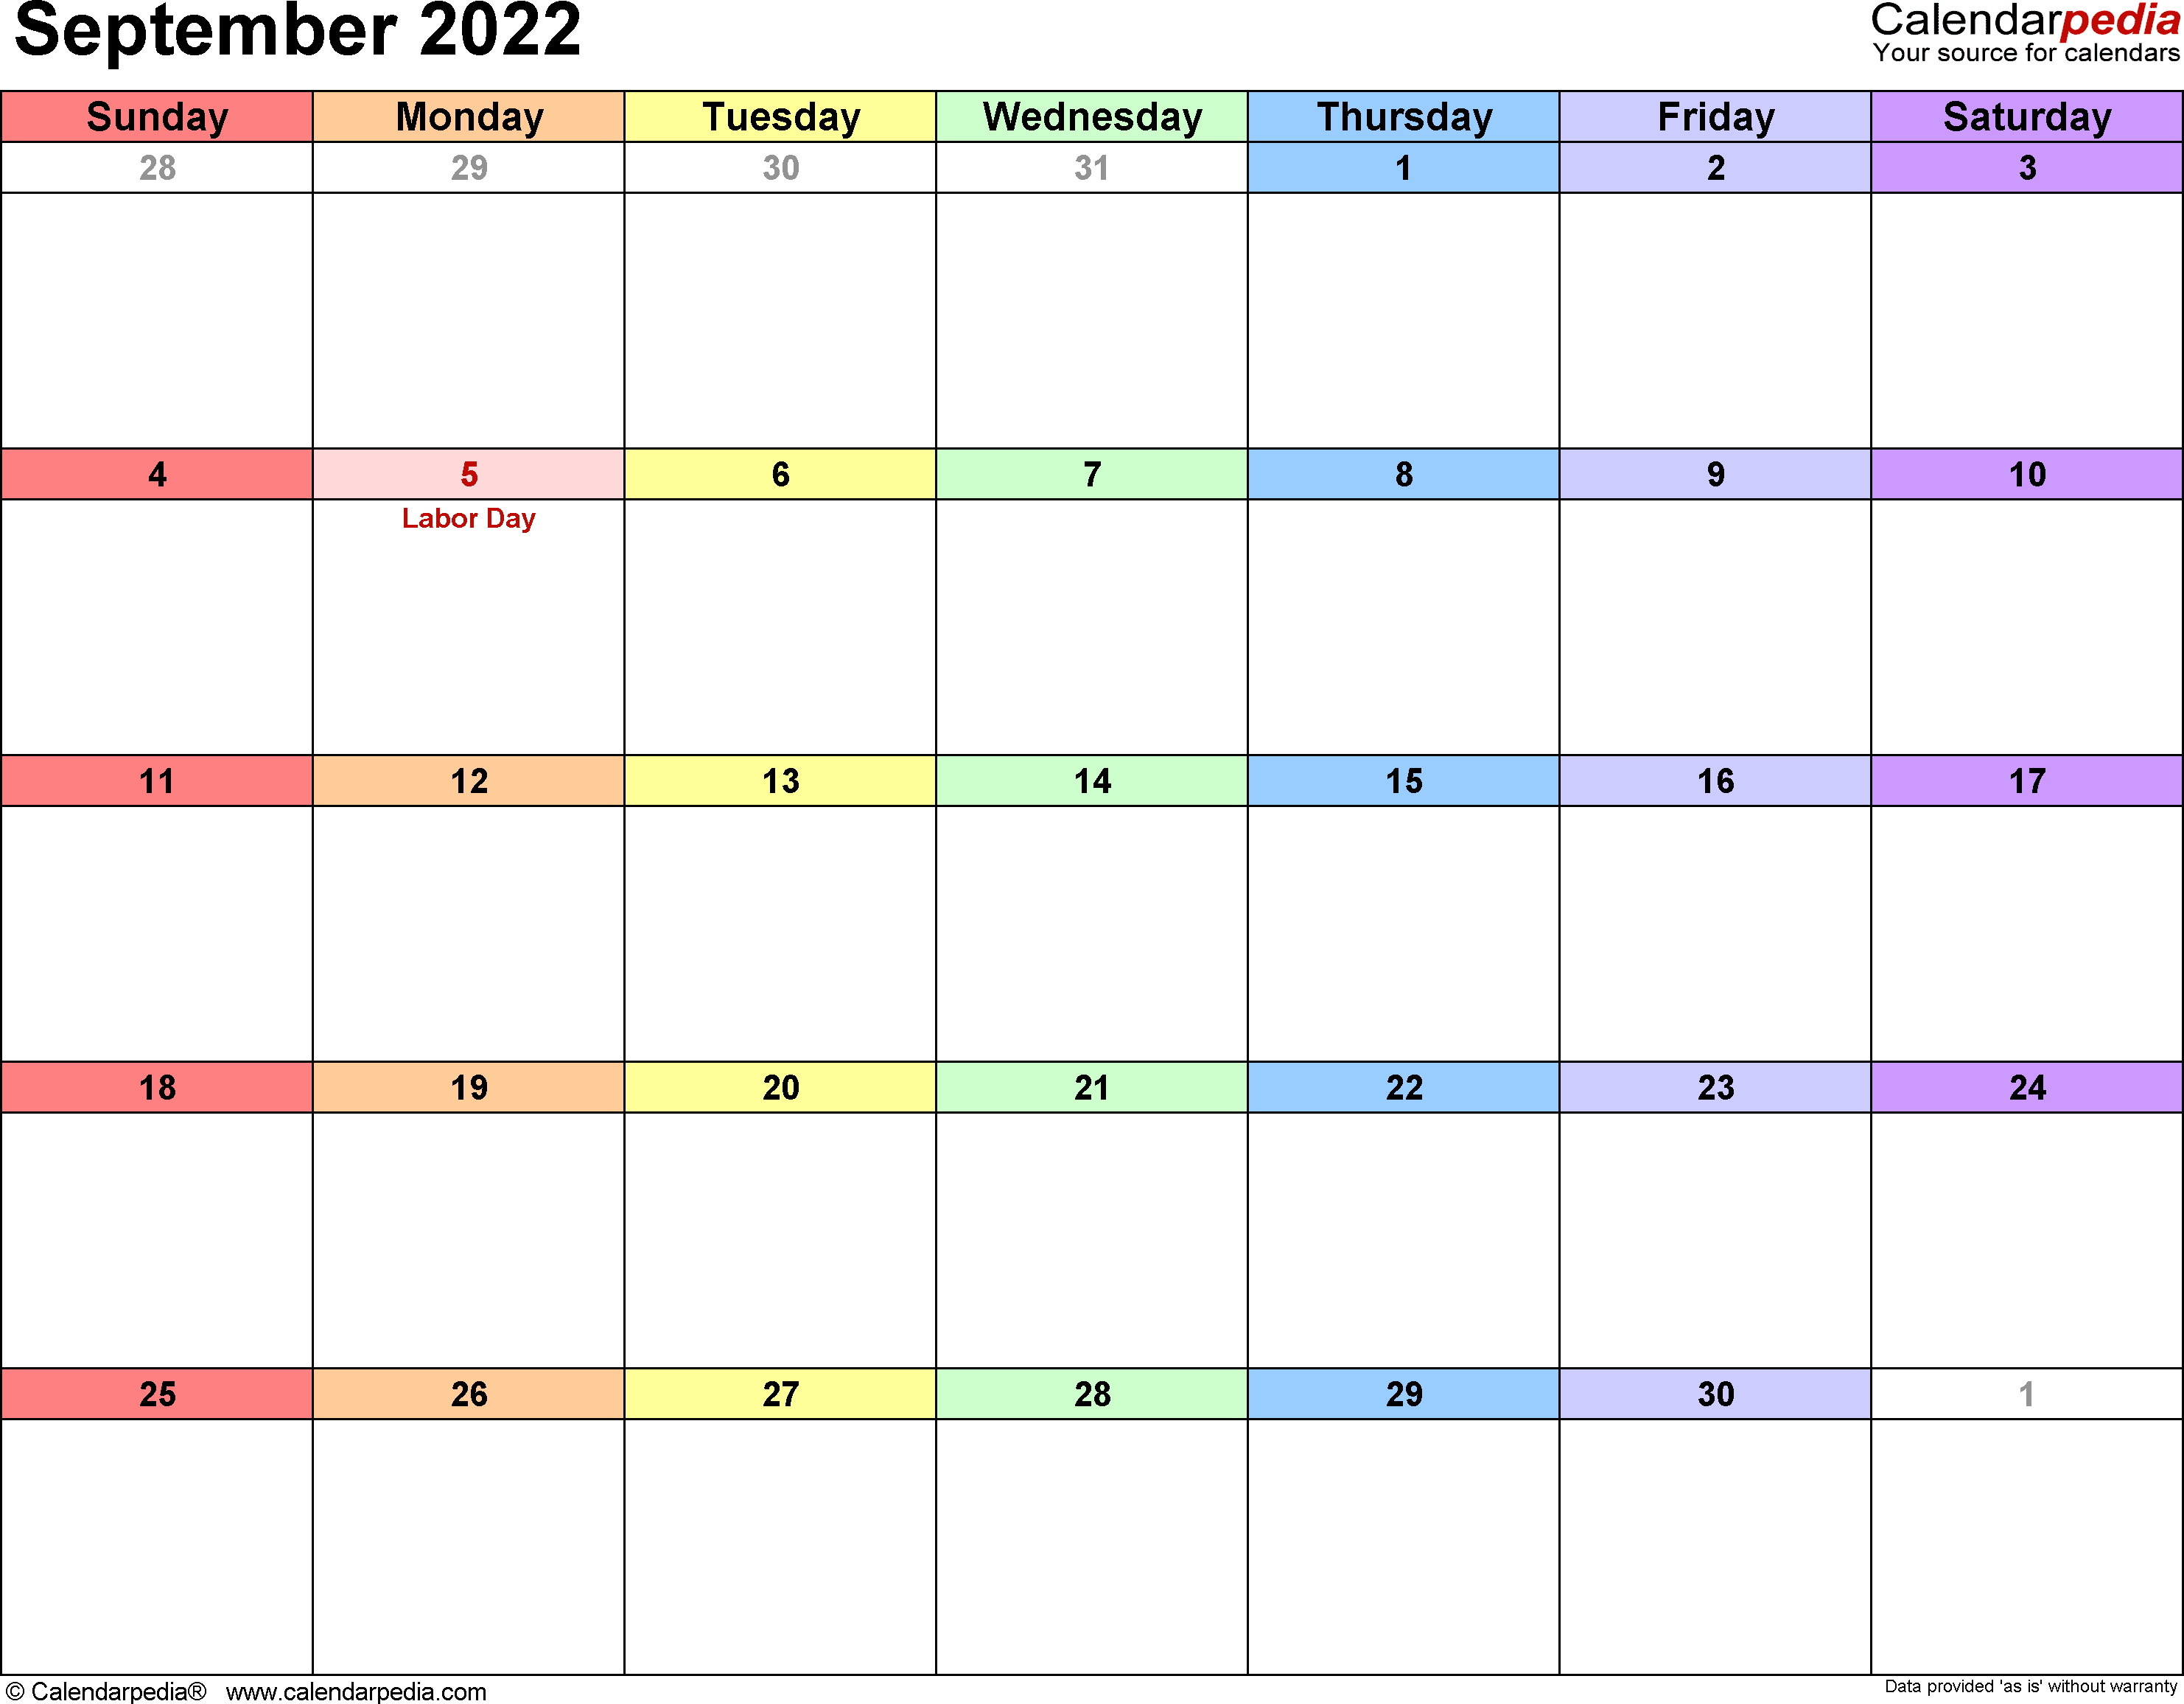 september 2022 calendar as image format September 2022 Calendars for Word, Excel & PDF